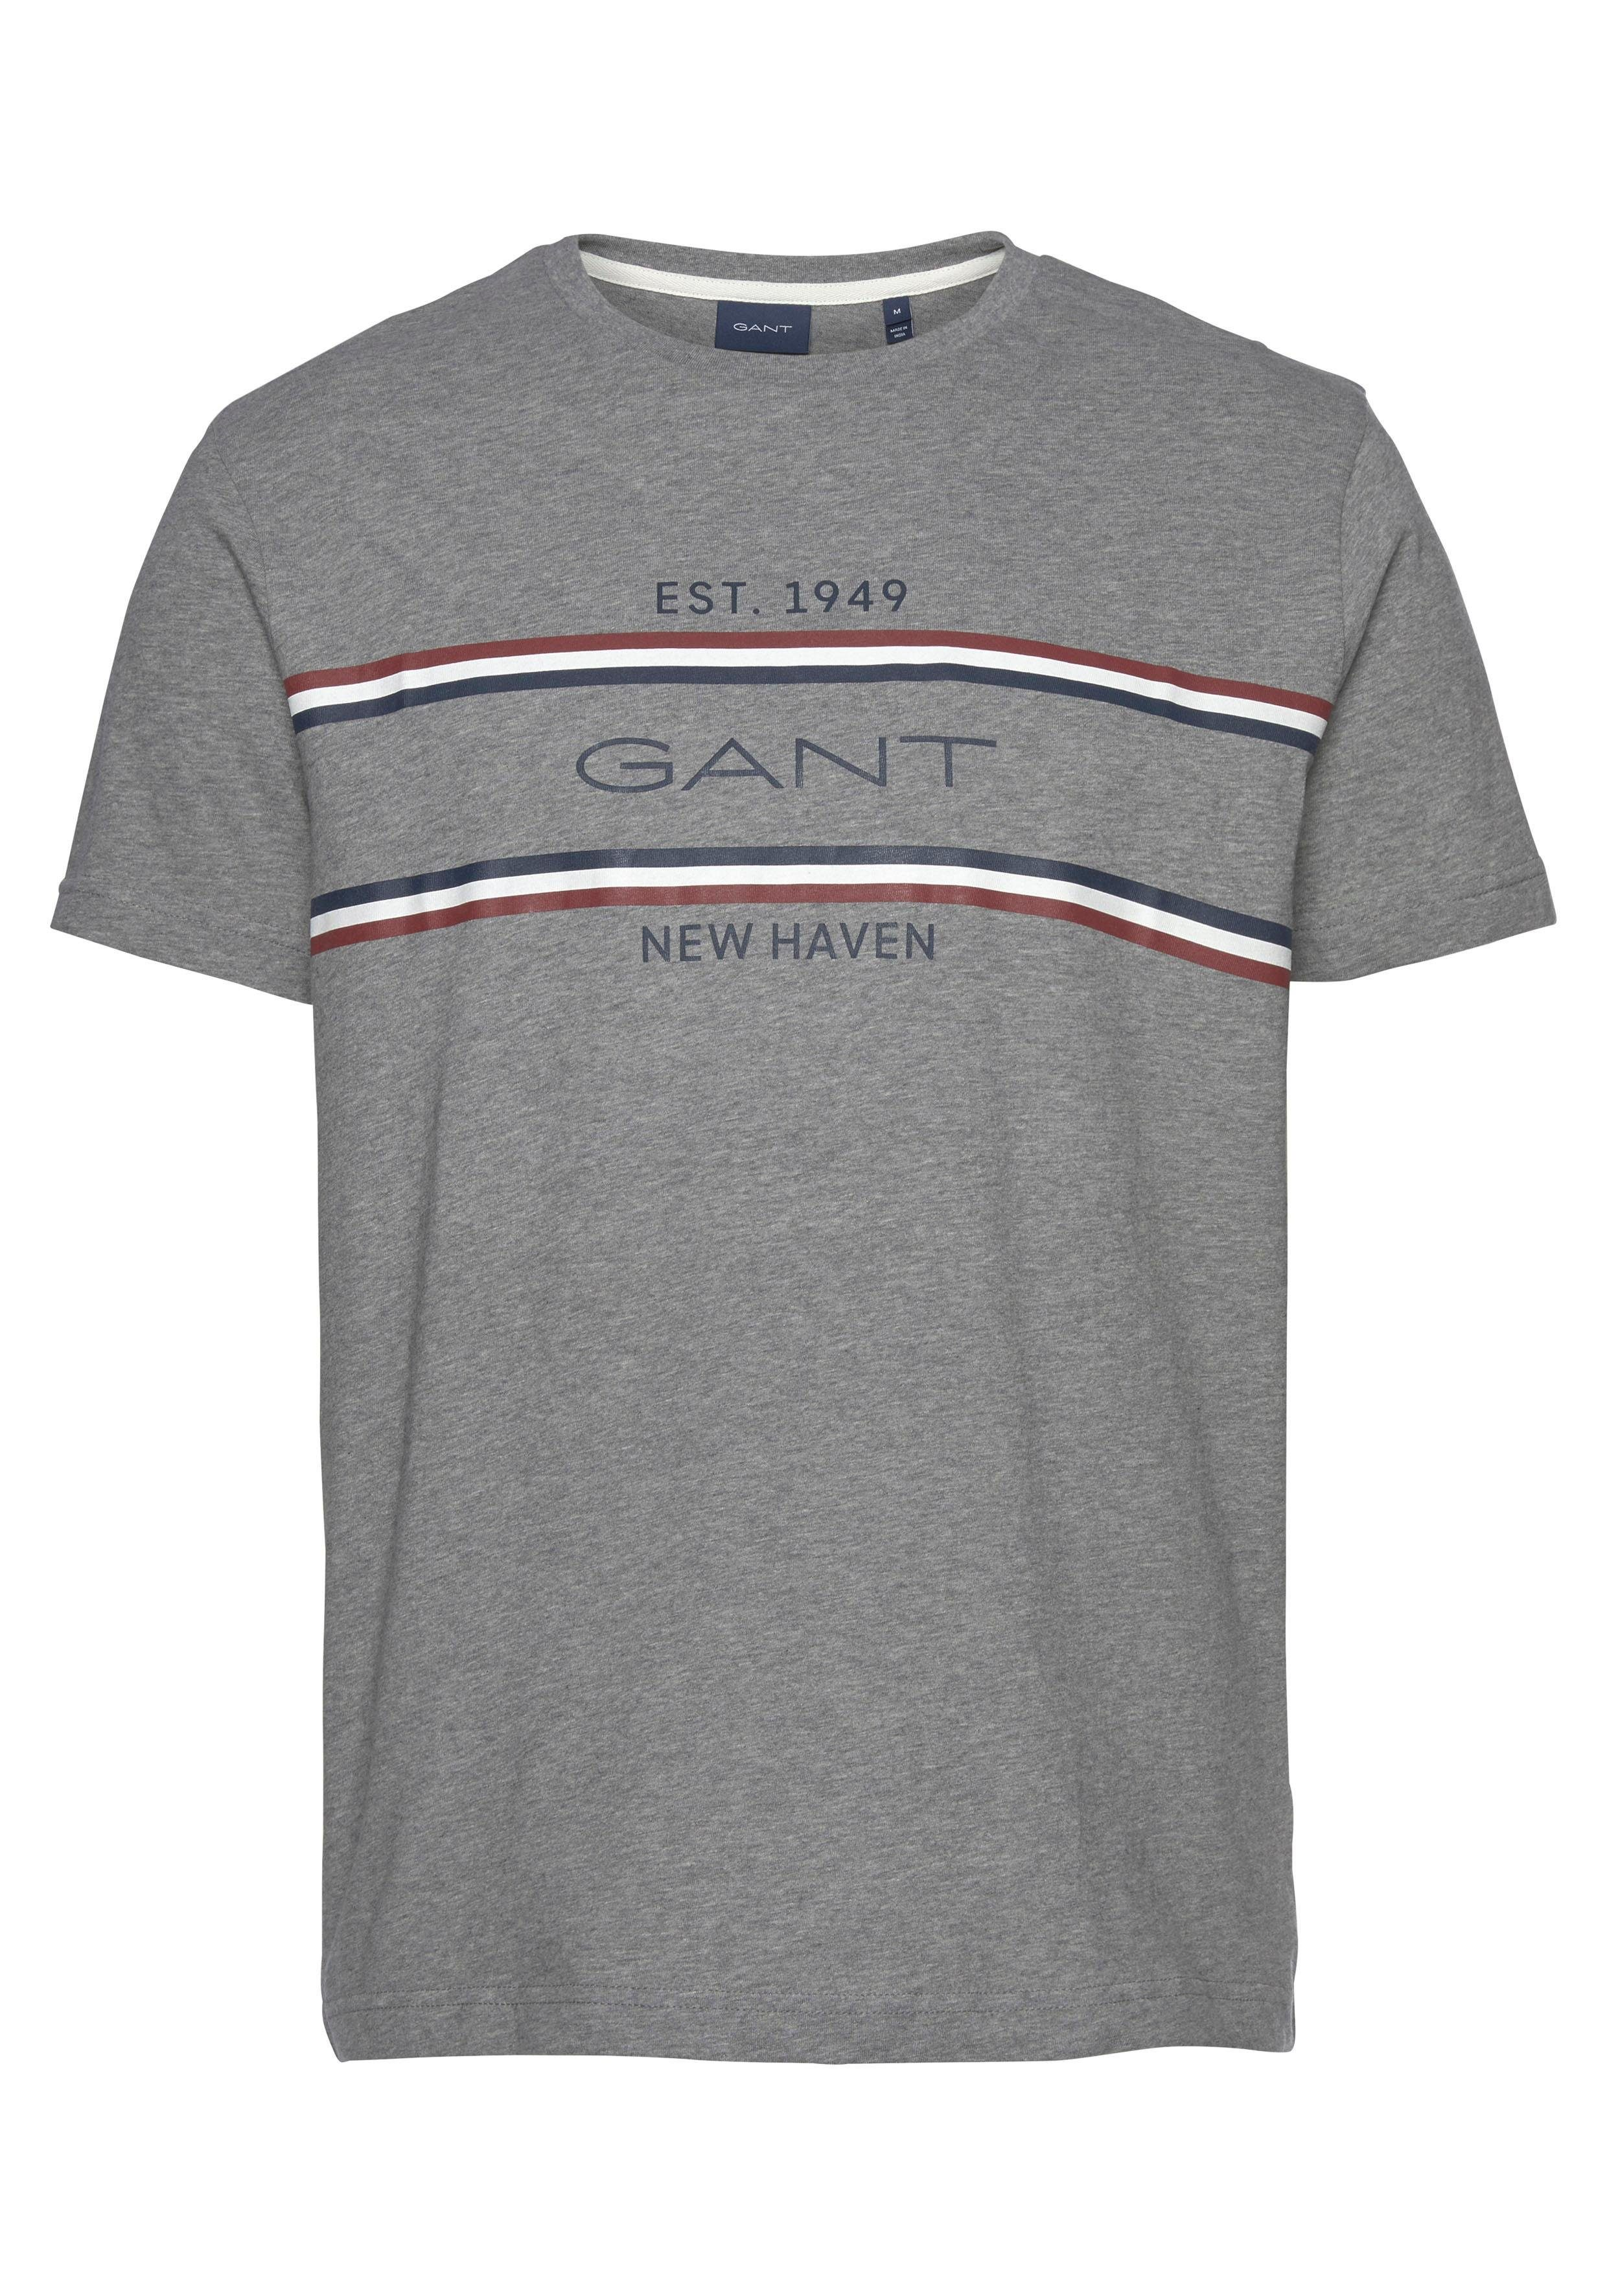 Gant T shirt 'archive Stripe' Herren Bekleidung T shirts